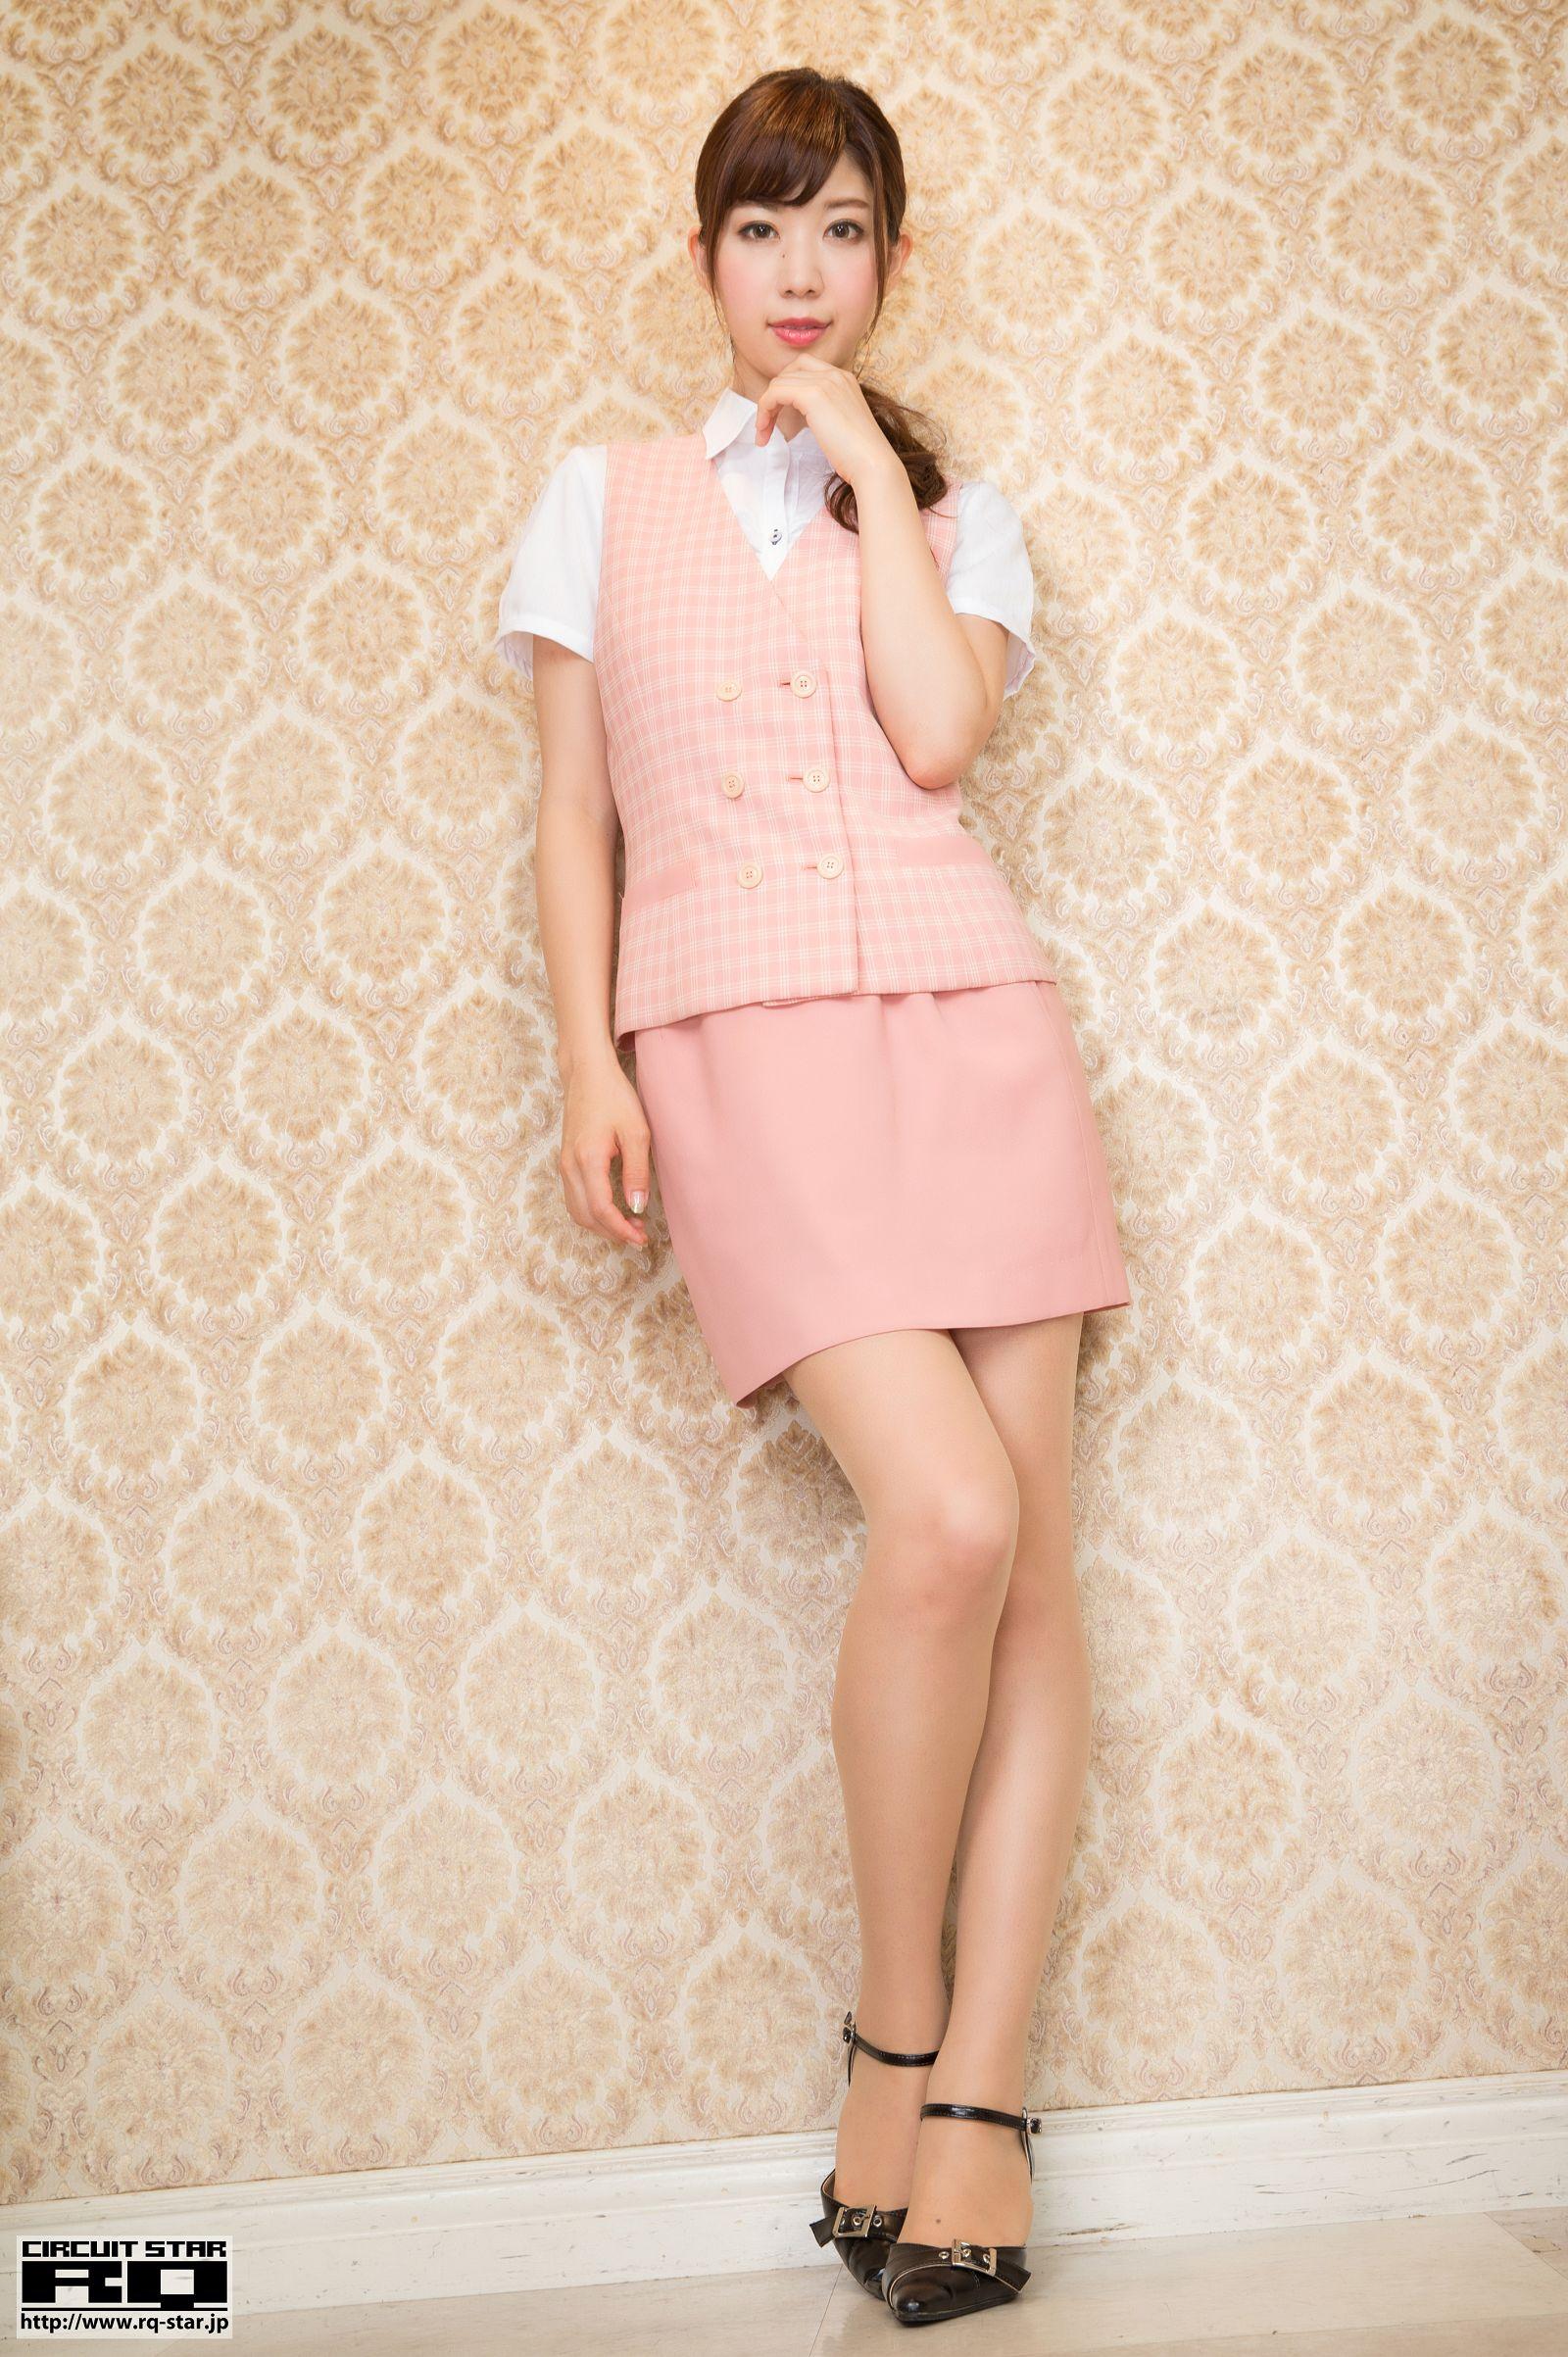 [RQ STAR美女] NO.01044 Chimu ちむ Office Lady[90P] RQ STAR 第2张